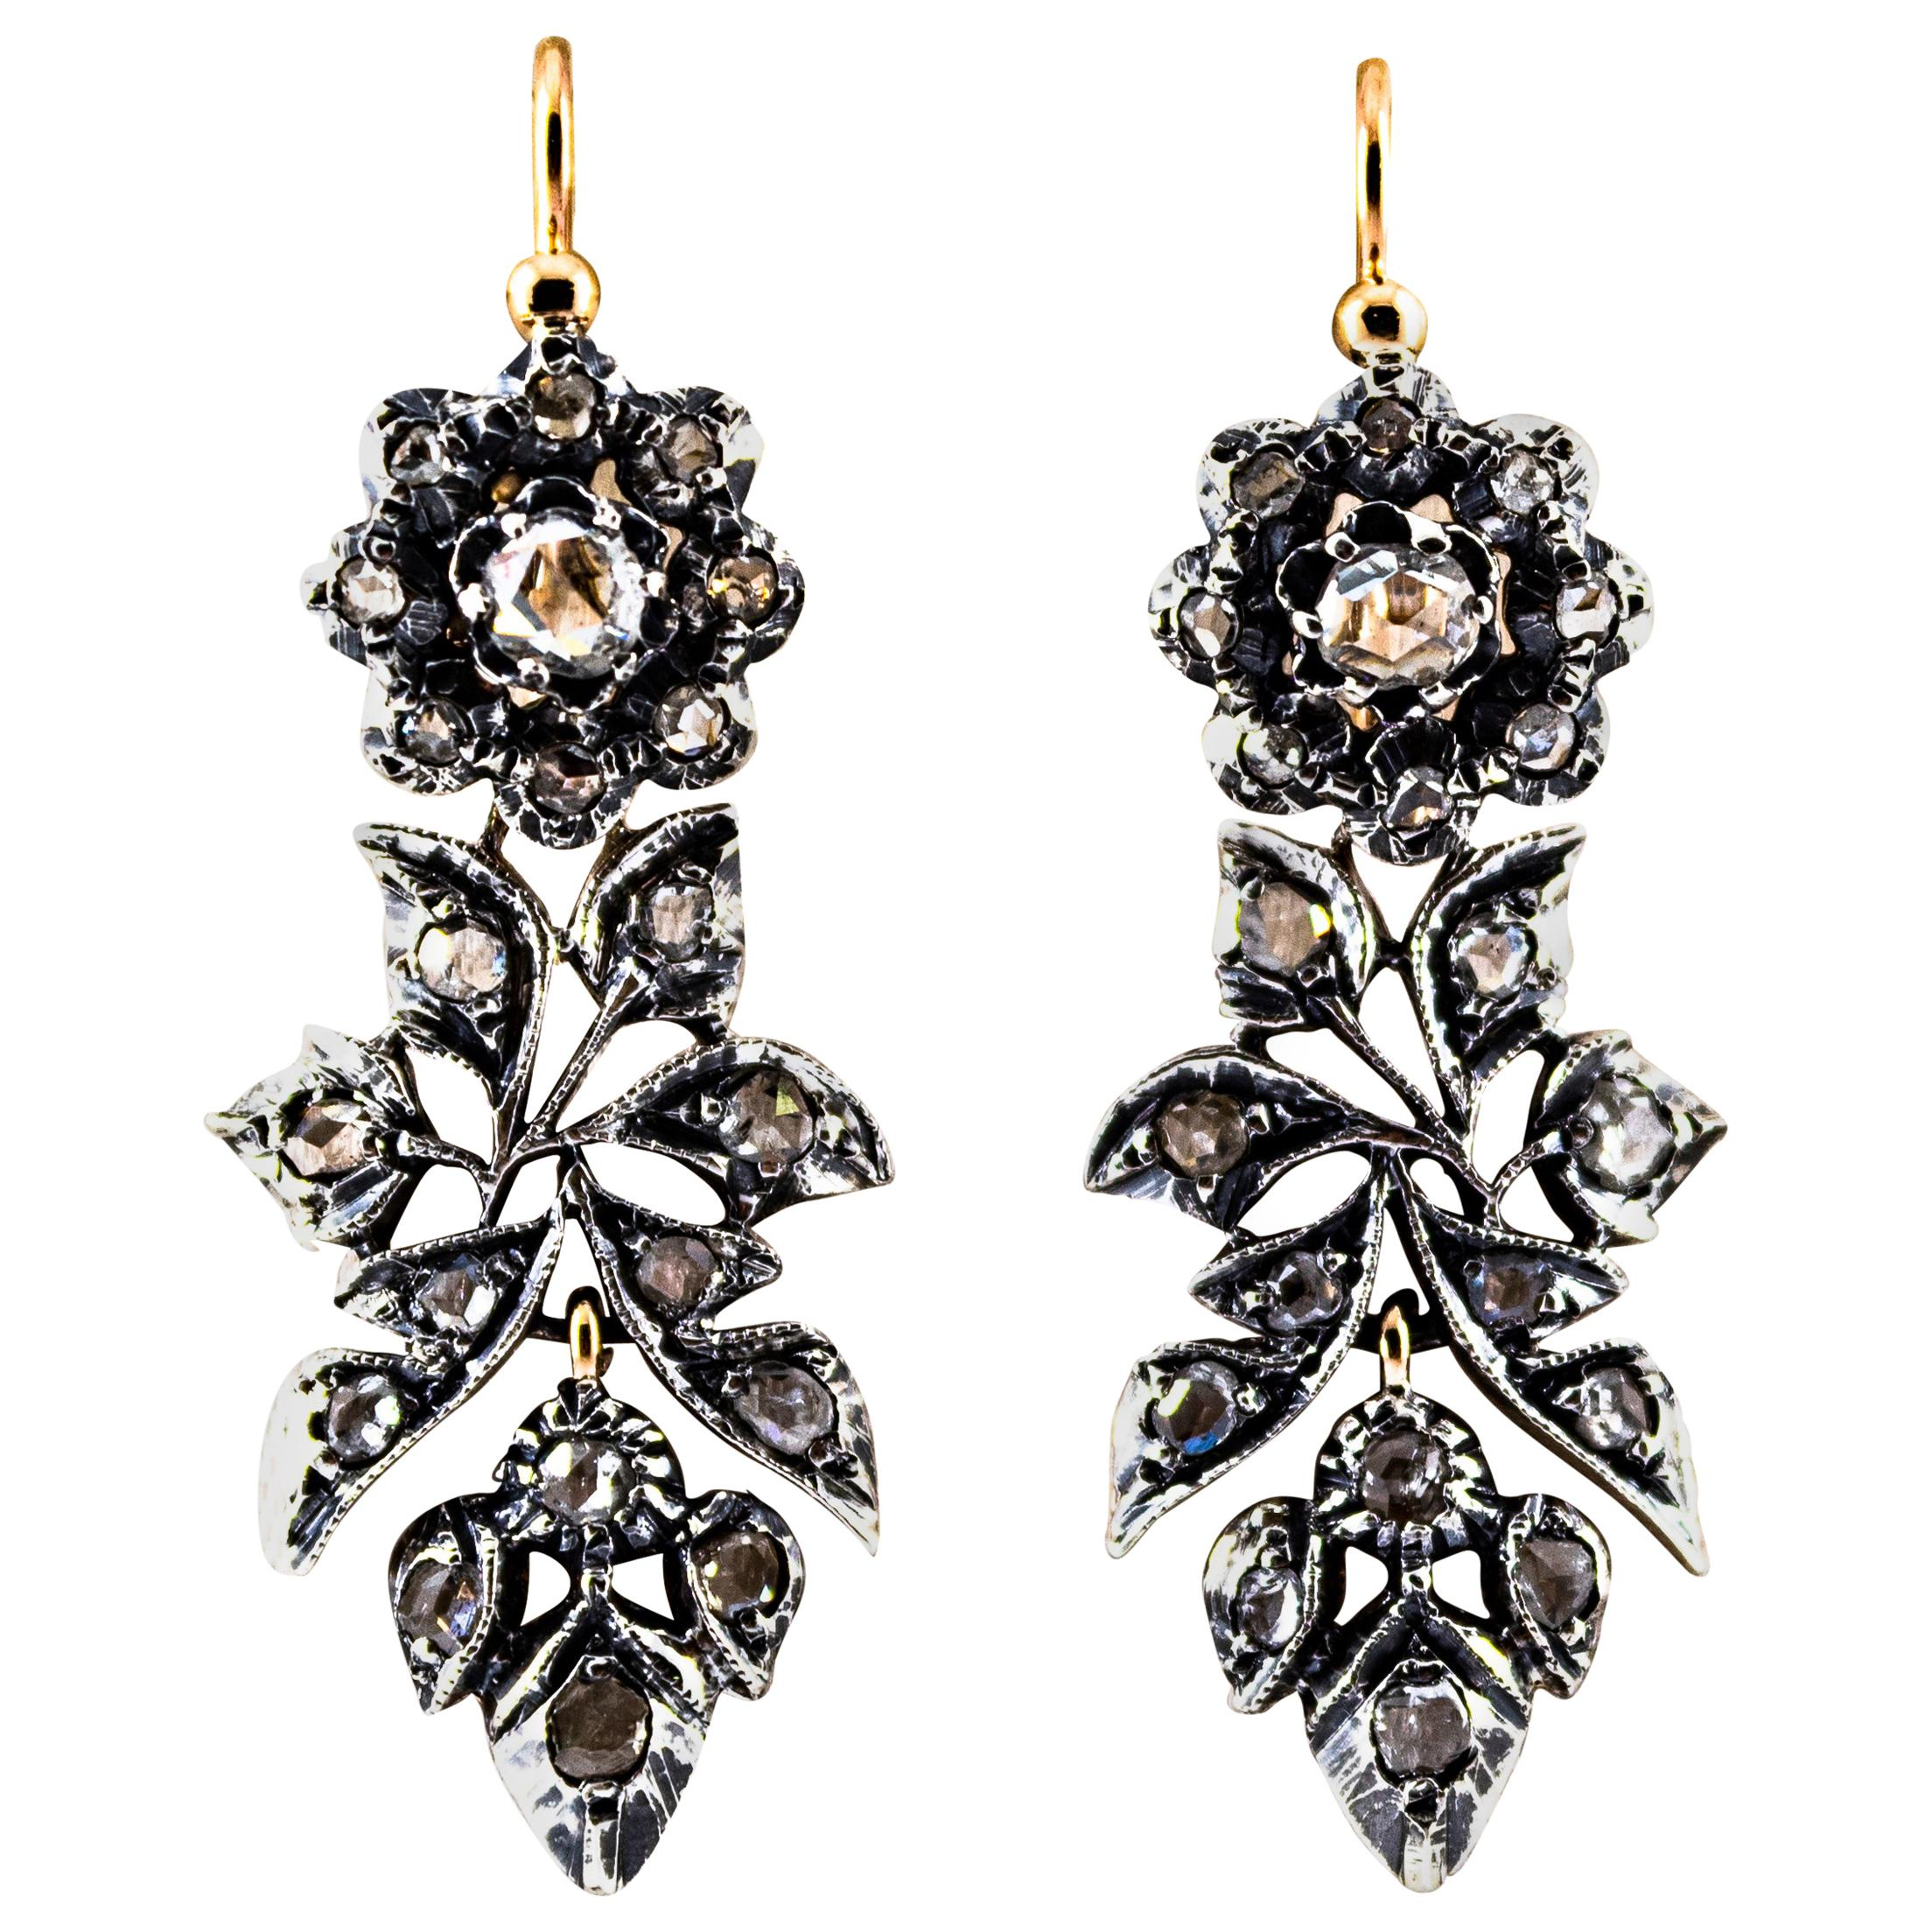 Art Nouveau 2.00 Carat White Rose Cut Diamonds Yellow Gold Lever-Back Earrings